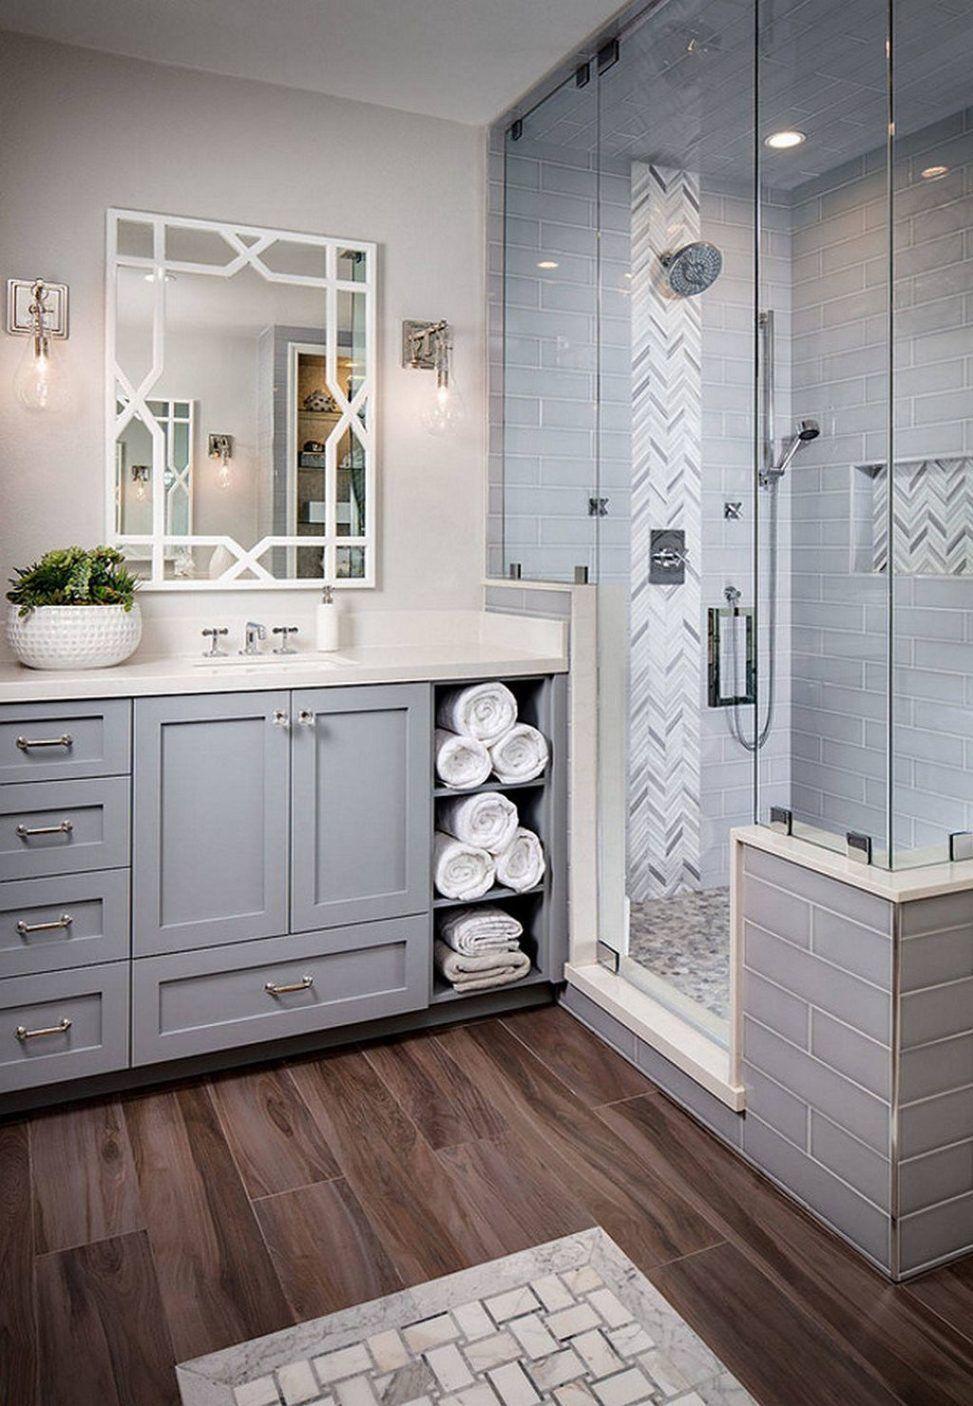 20 Bathroom Remodel Ideas With Smart Diy Tricks Bathroom Tile Designs Bathroom Remodel Master Bathroom Layout